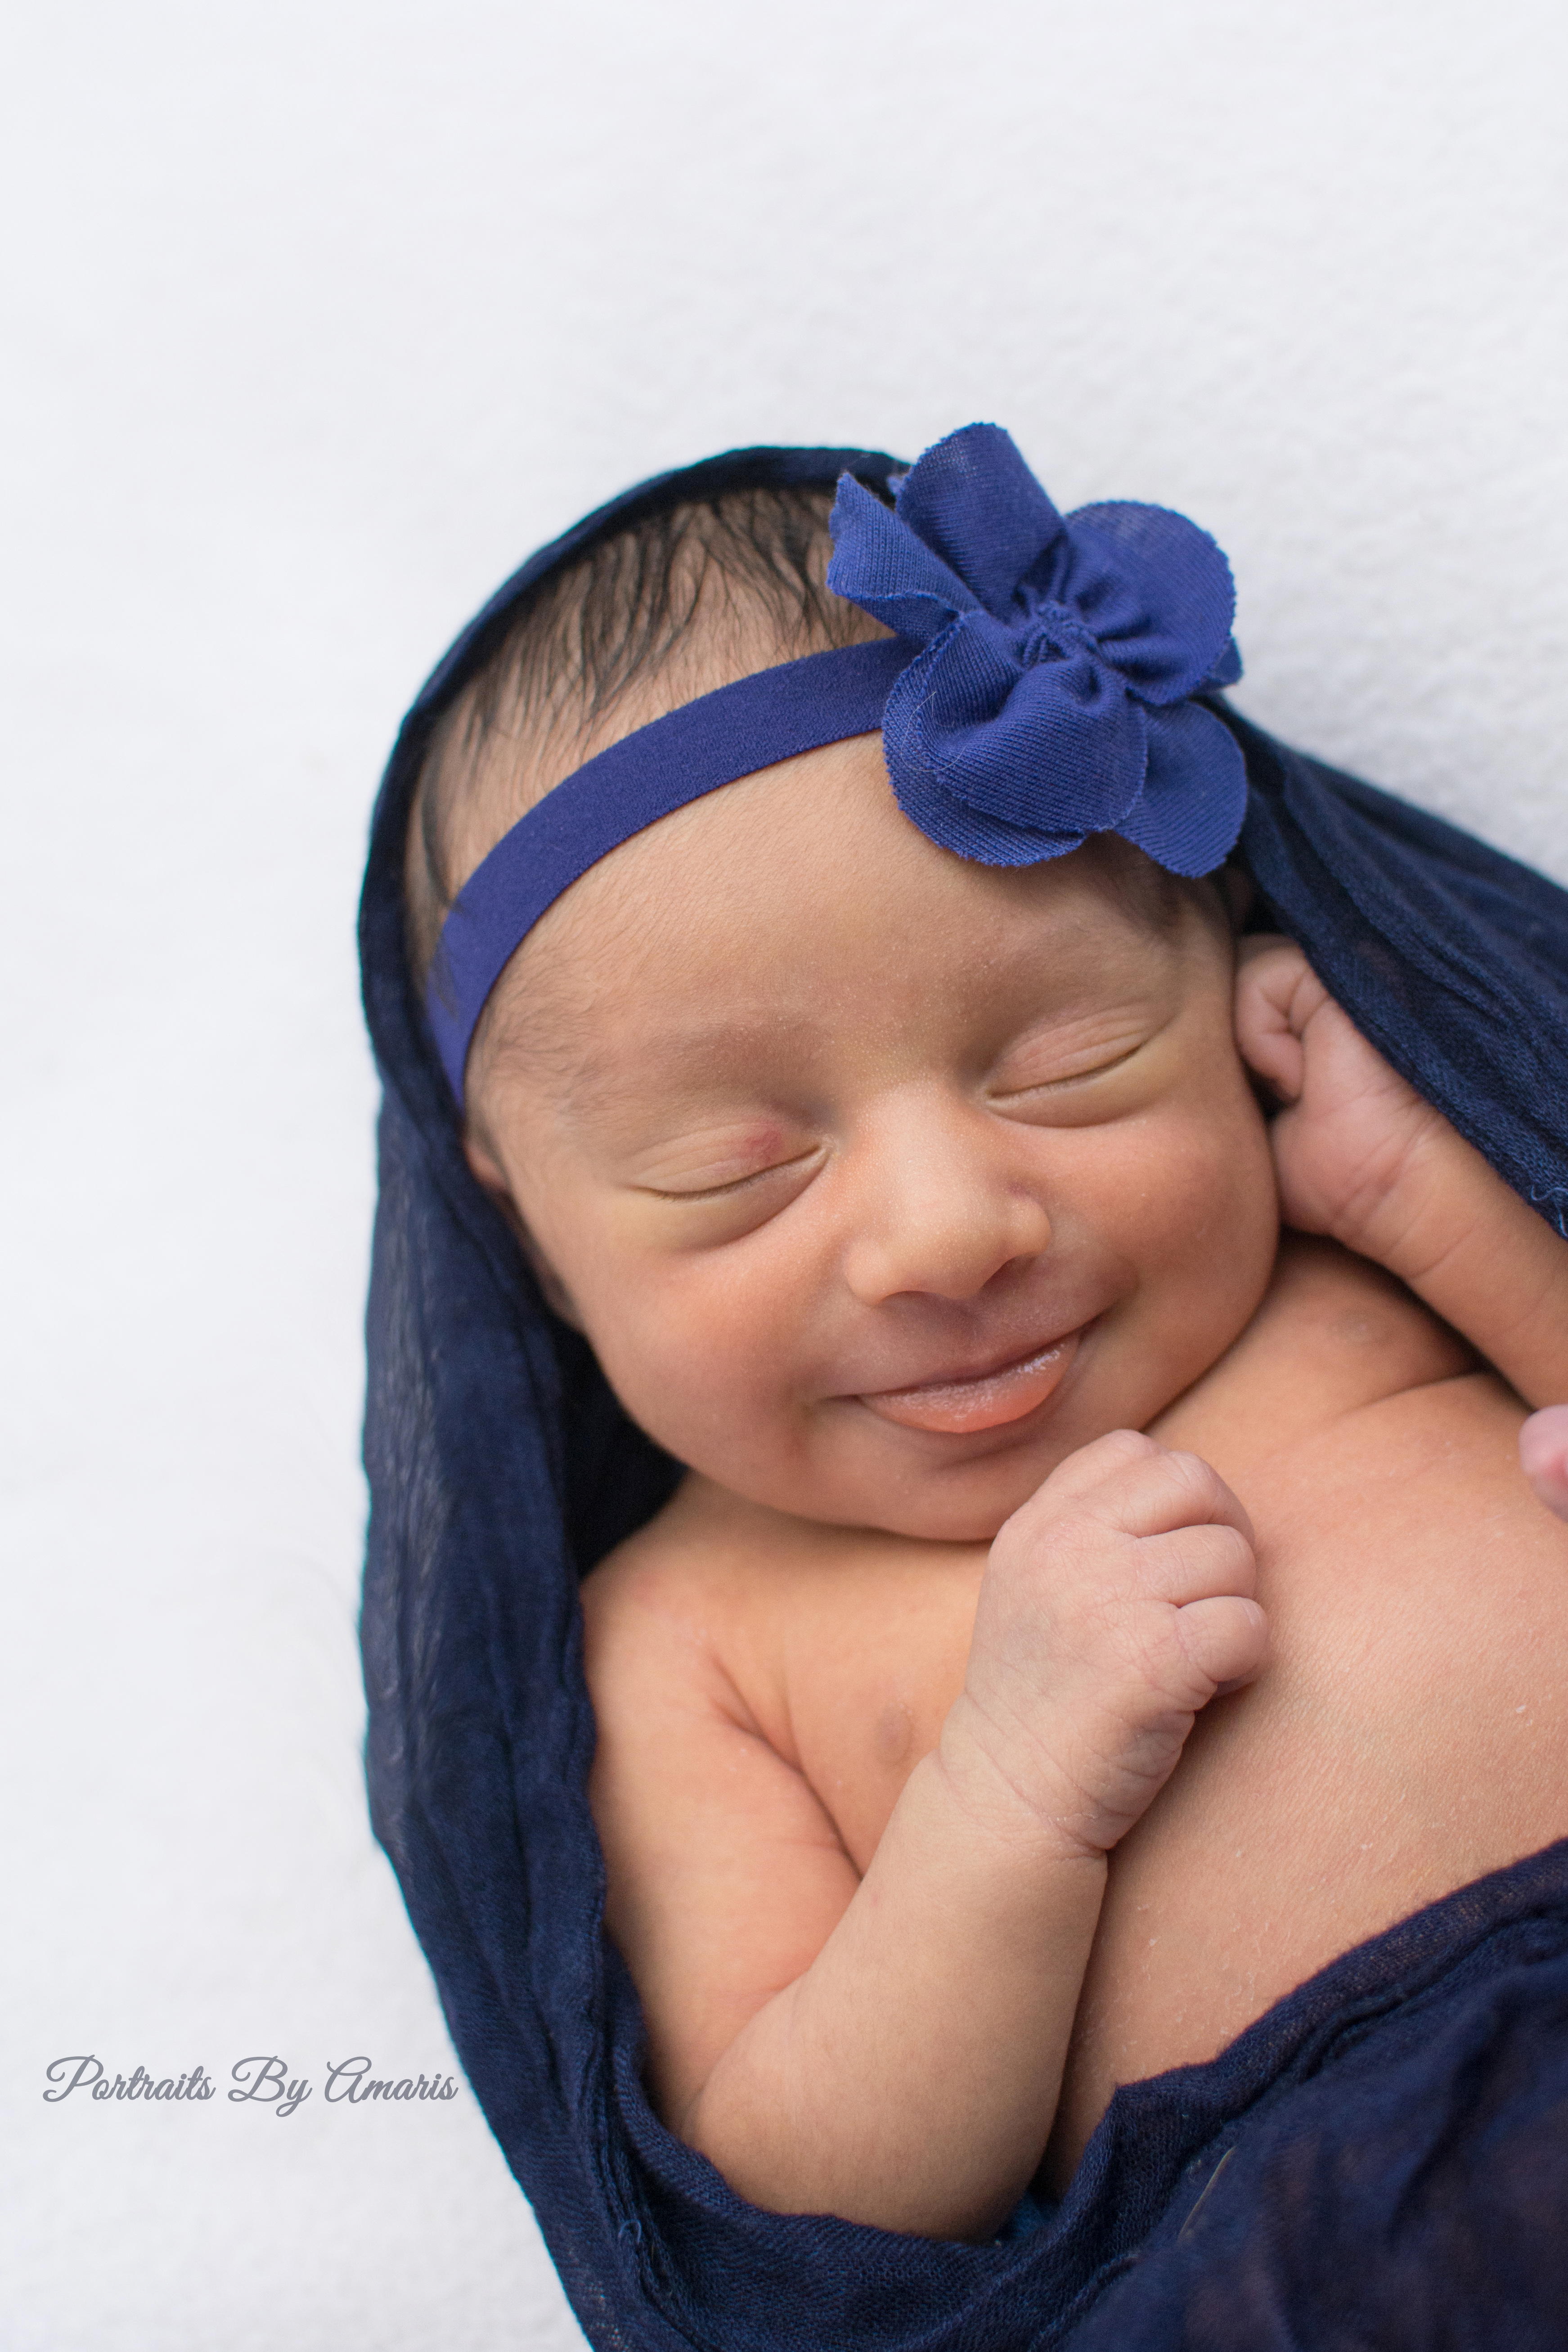 Newborn girl smiling in blue